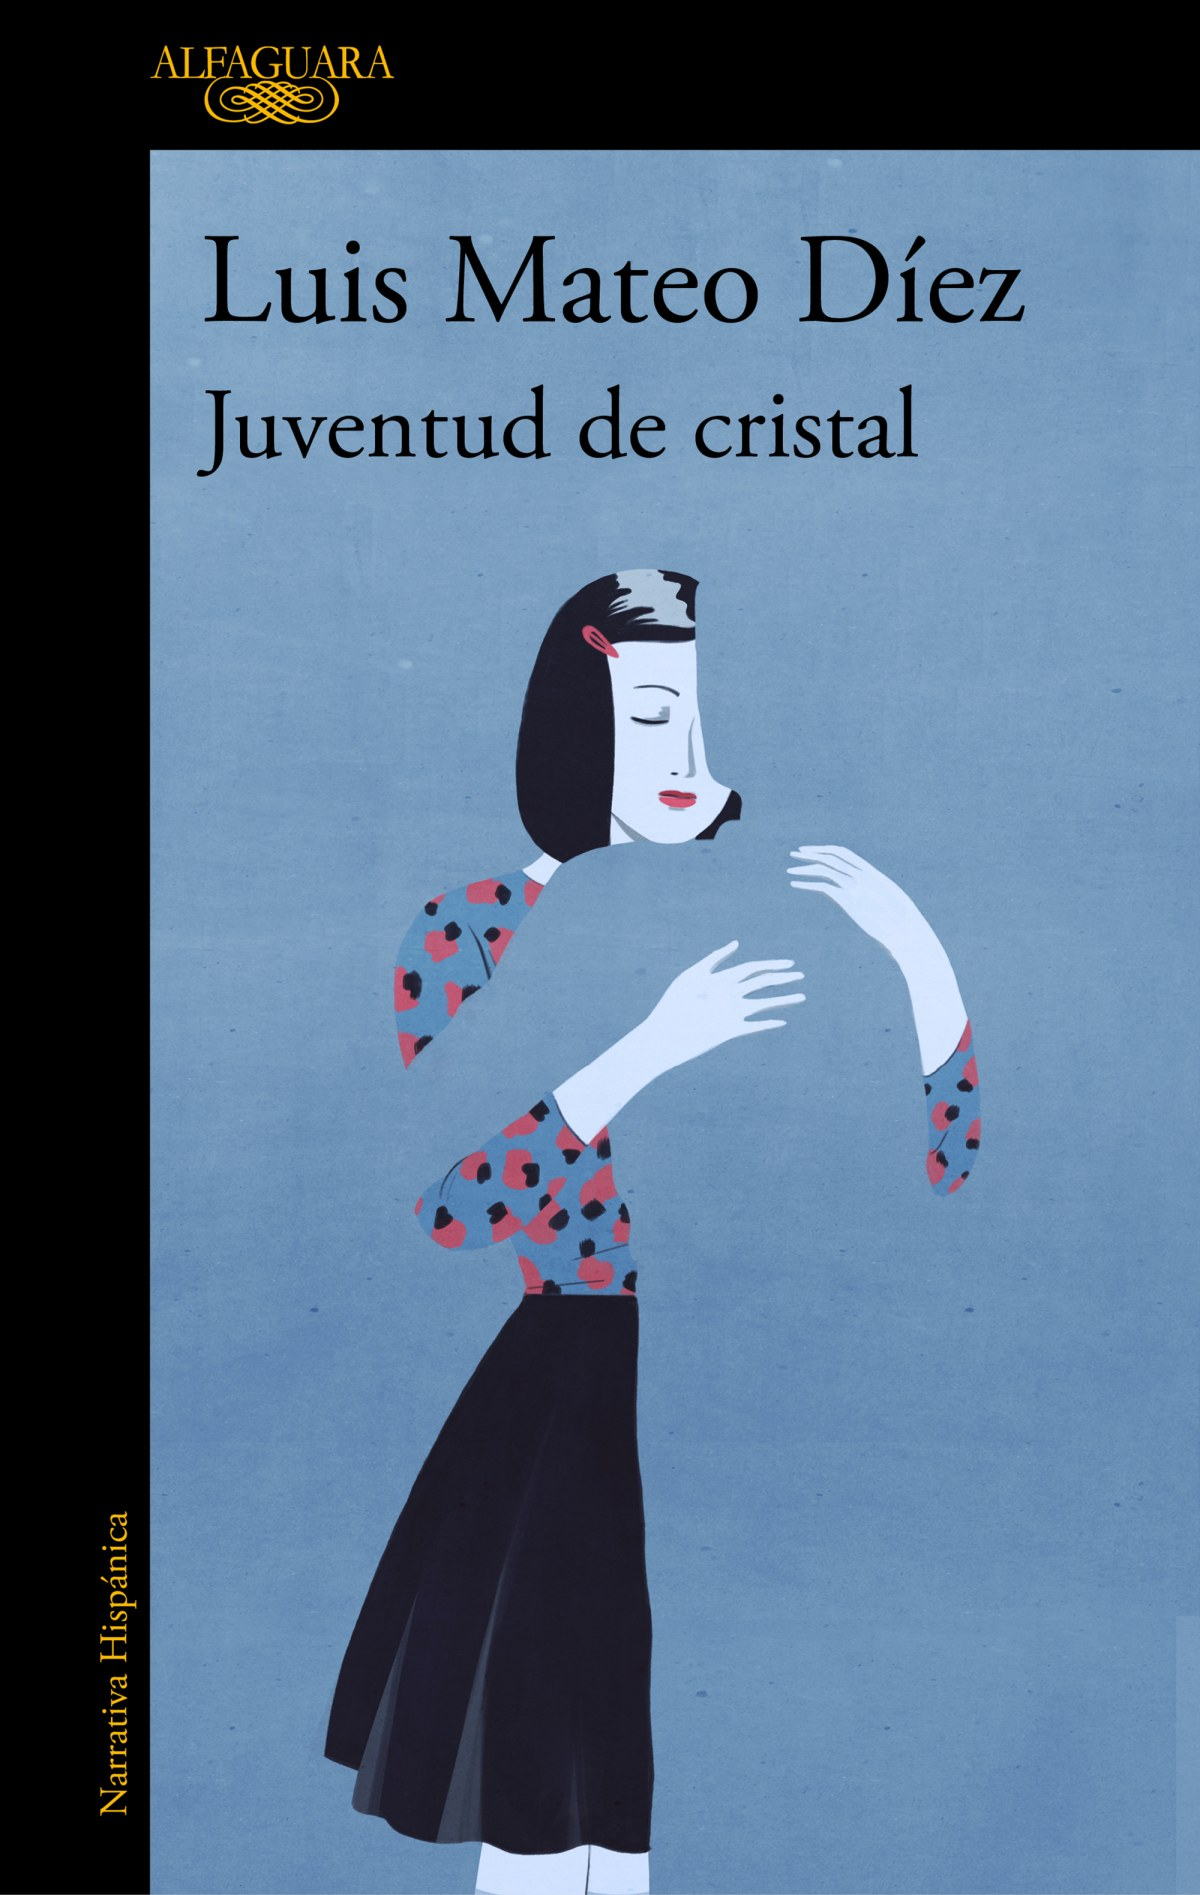 JUVENTUD DE CRISTAL 9788420435657